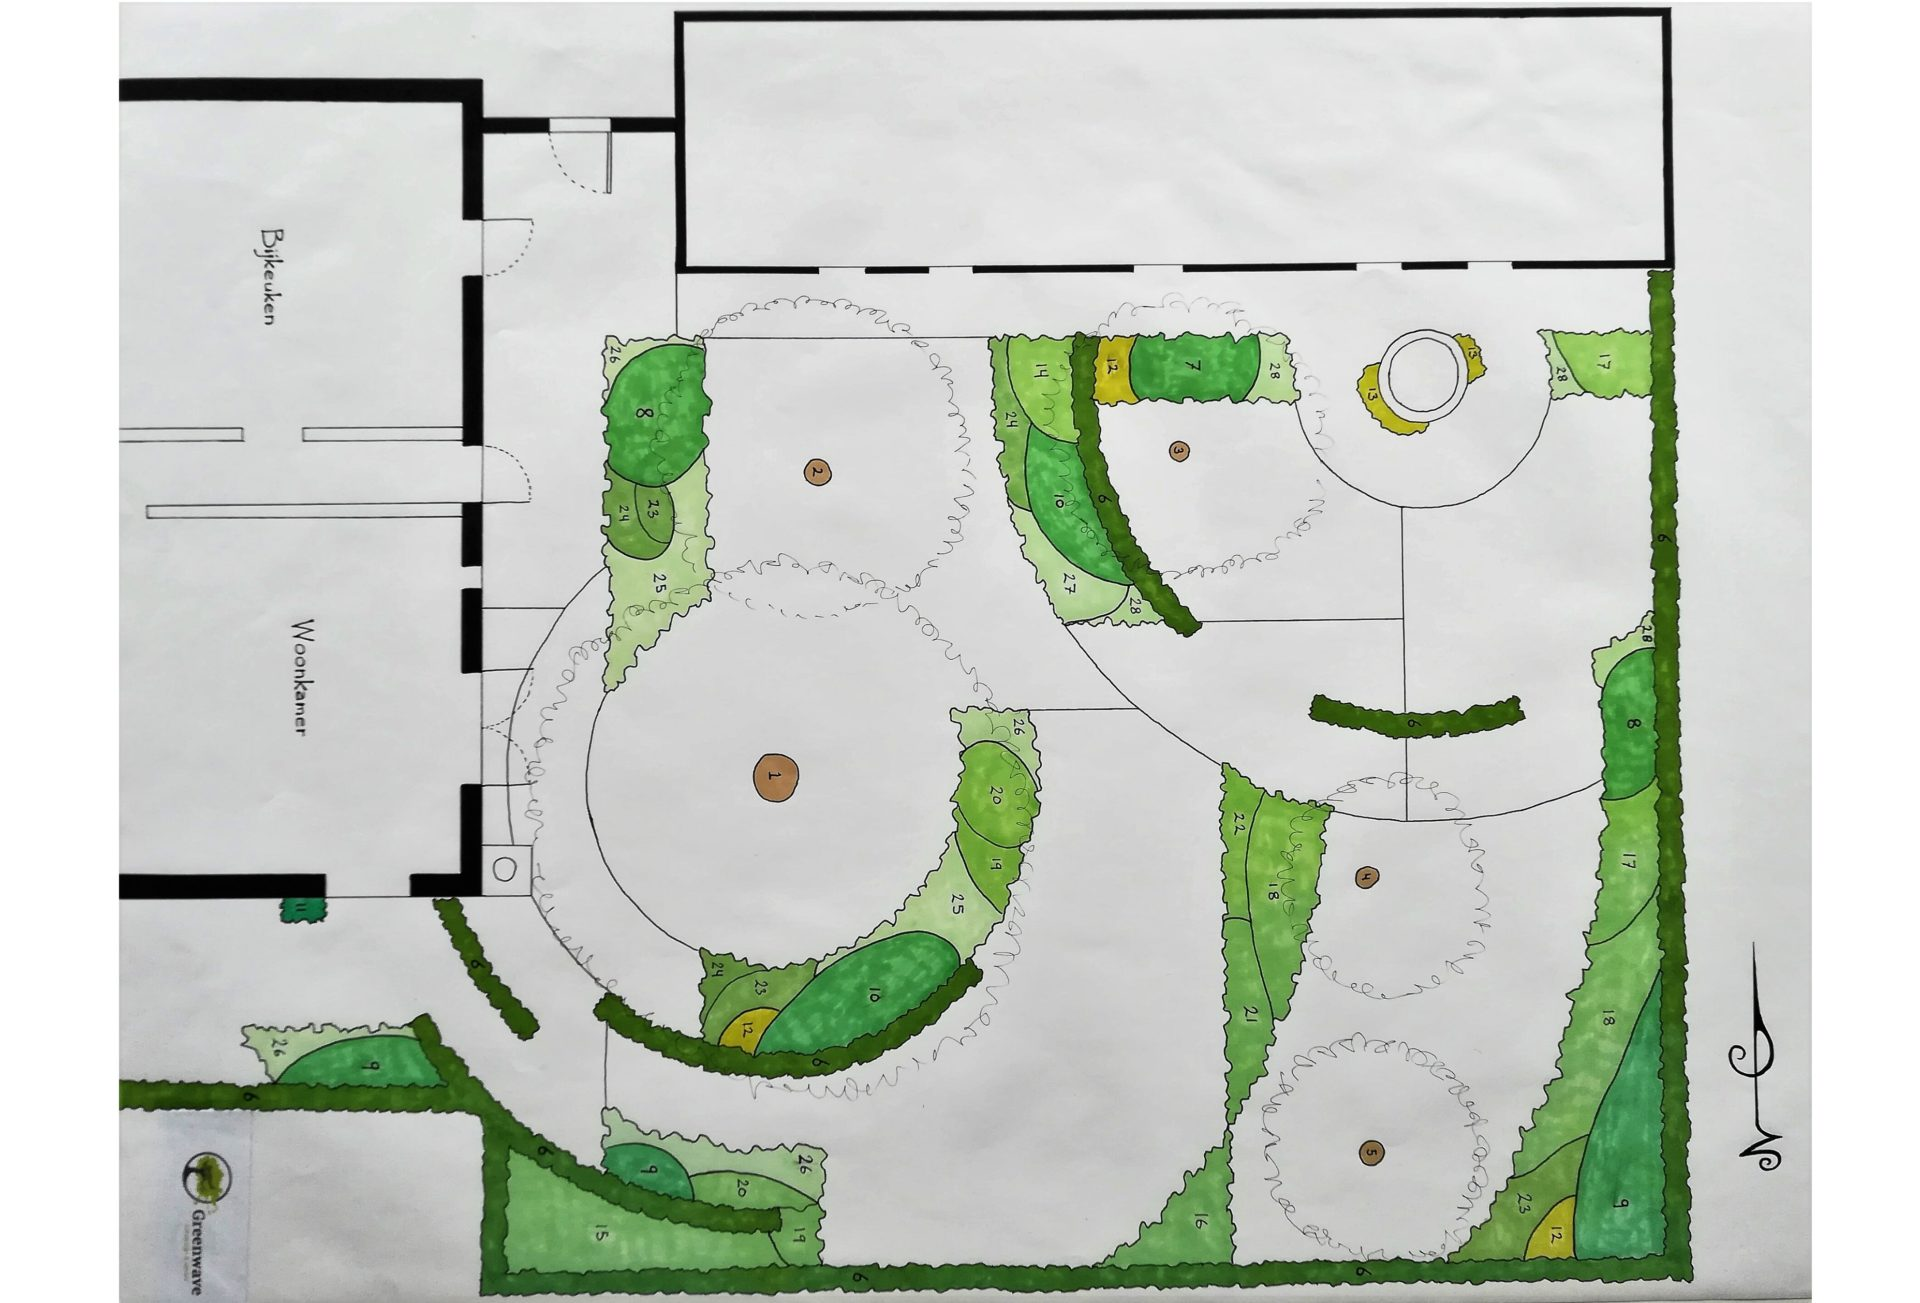 beplantingsplan moderne boerderijtuin